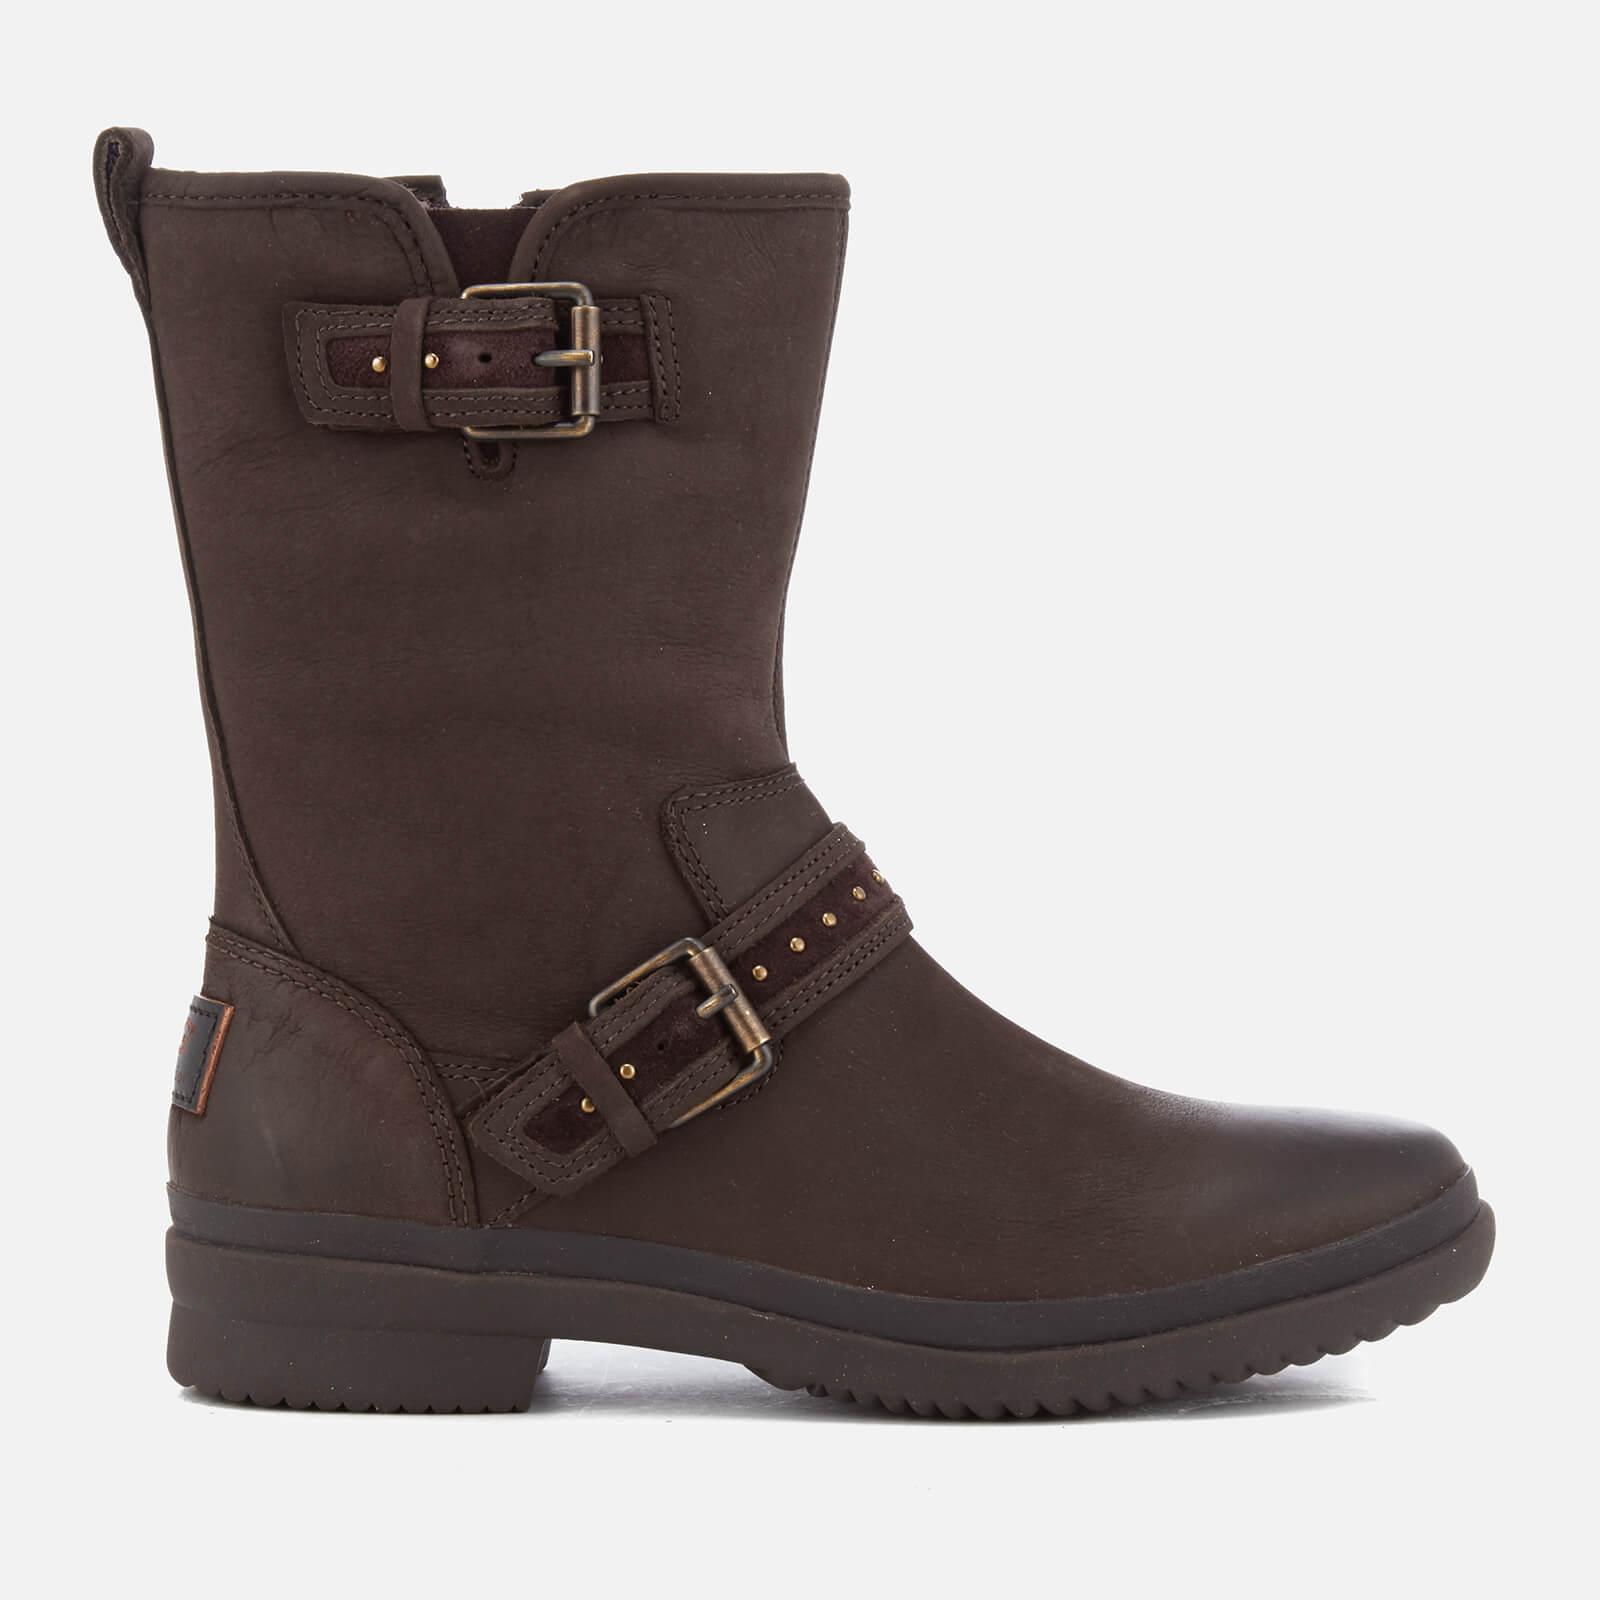 c3c2da3d96e UGG Women's Jenise Waterproof Leather Biker Boots - Stout